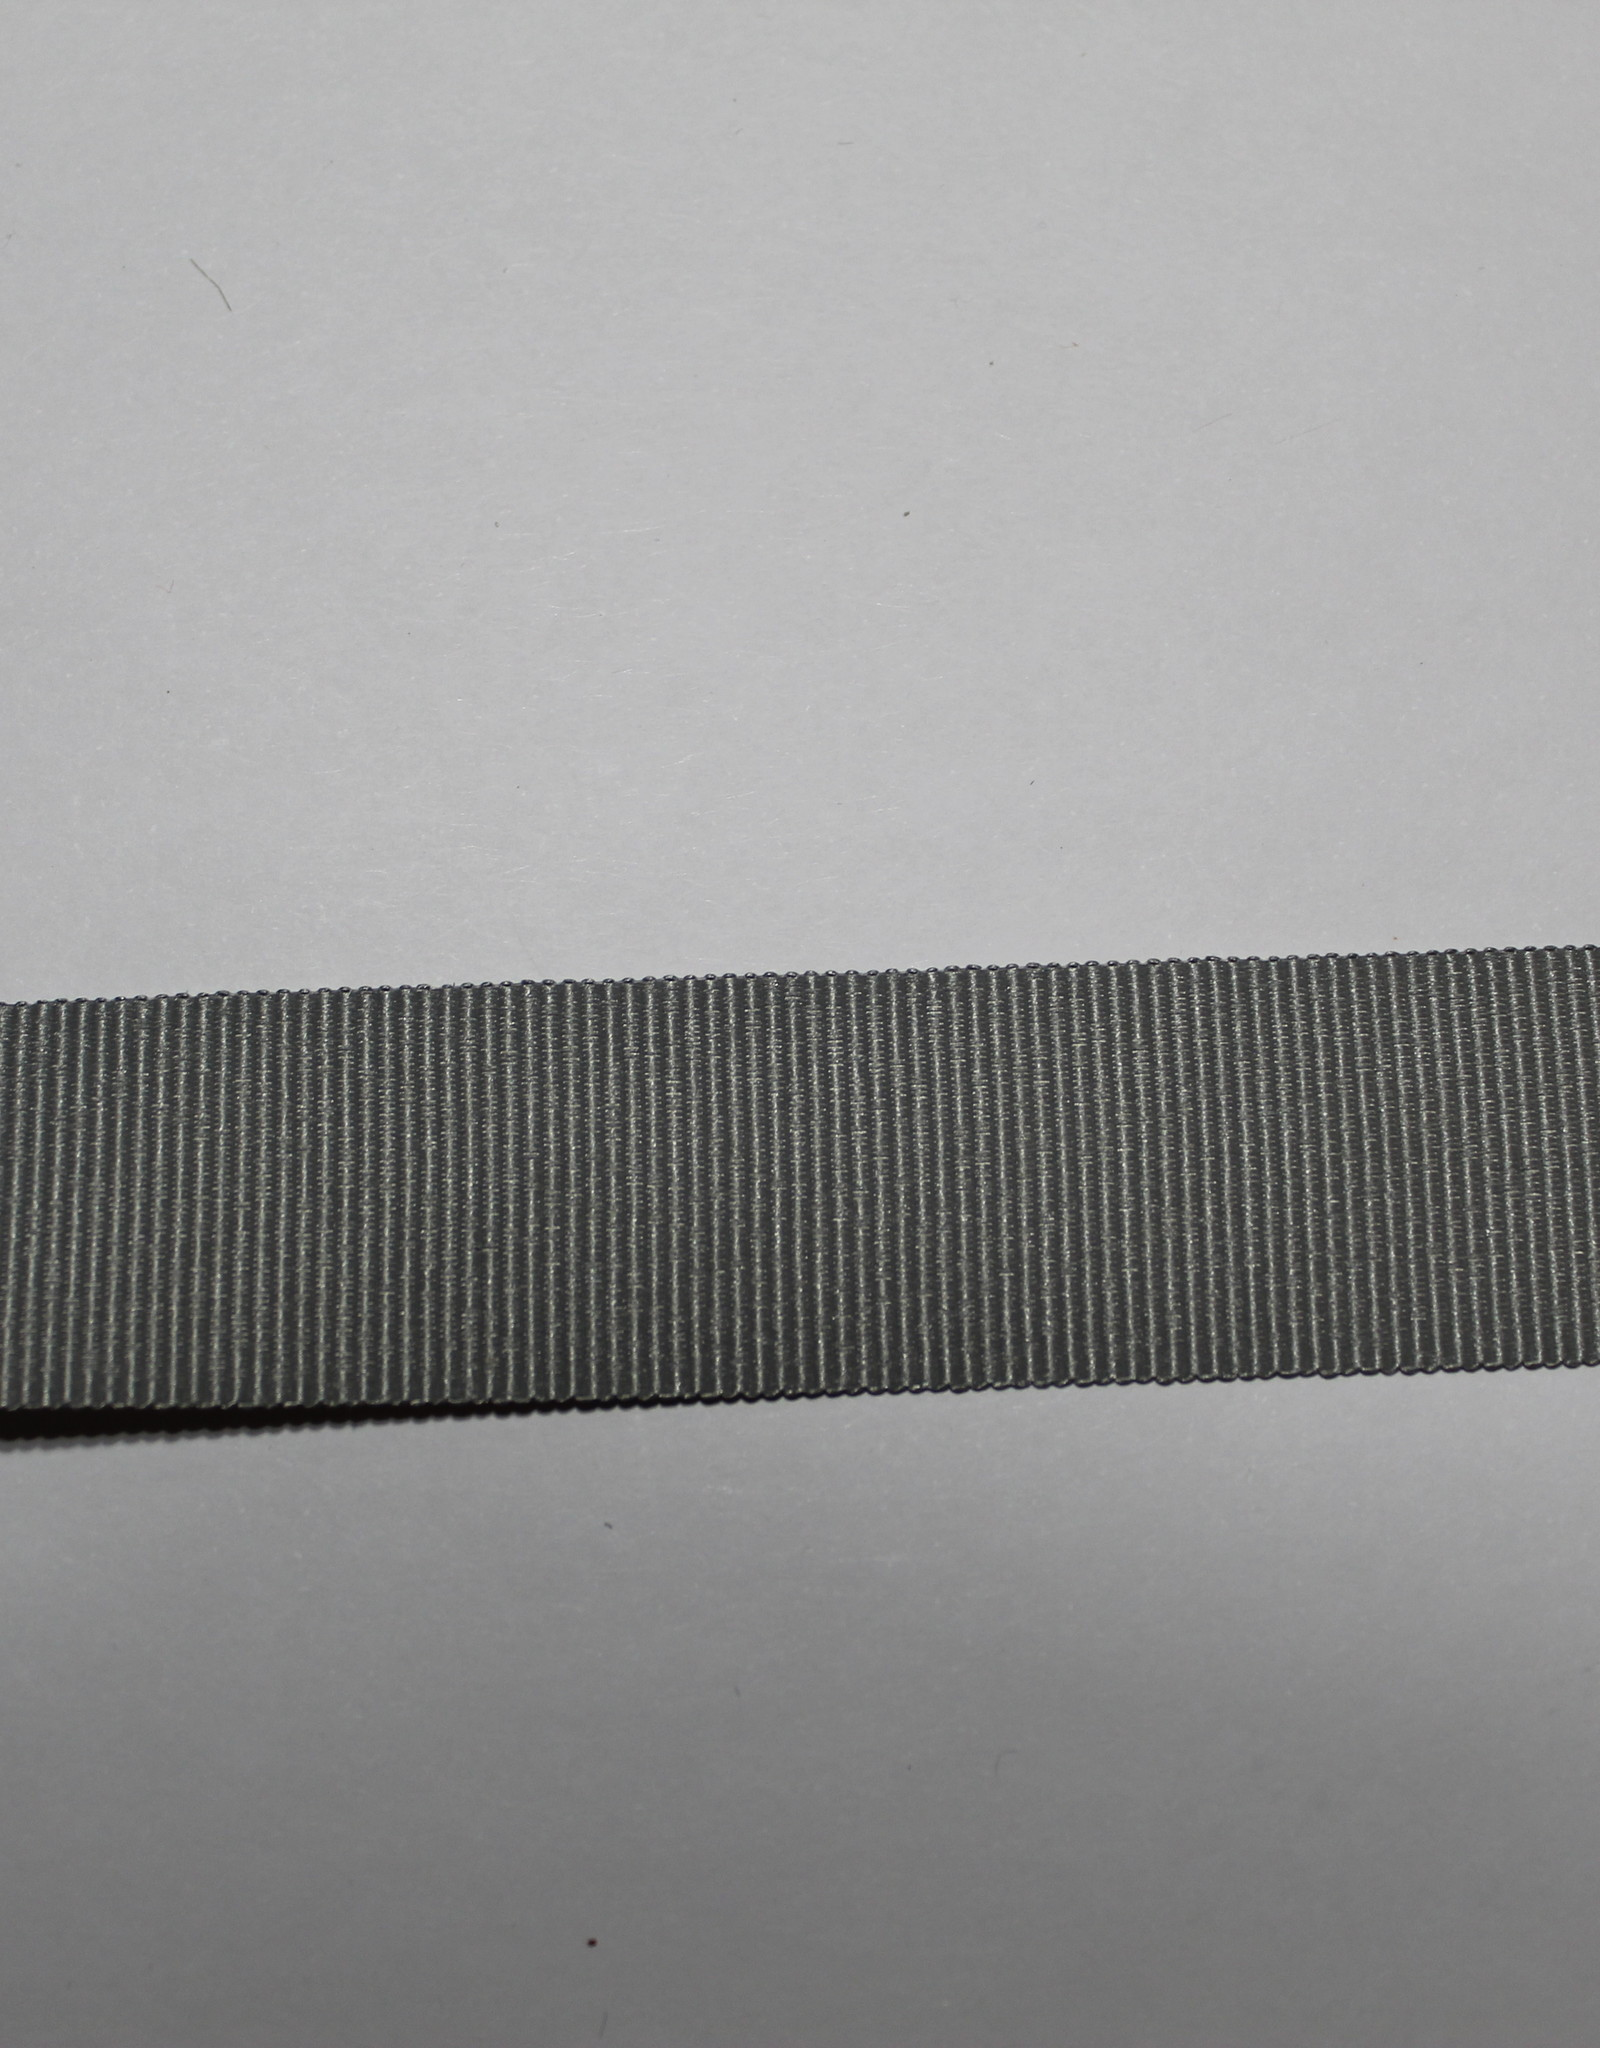 Ripslint 25mm lichtgrijs col.004